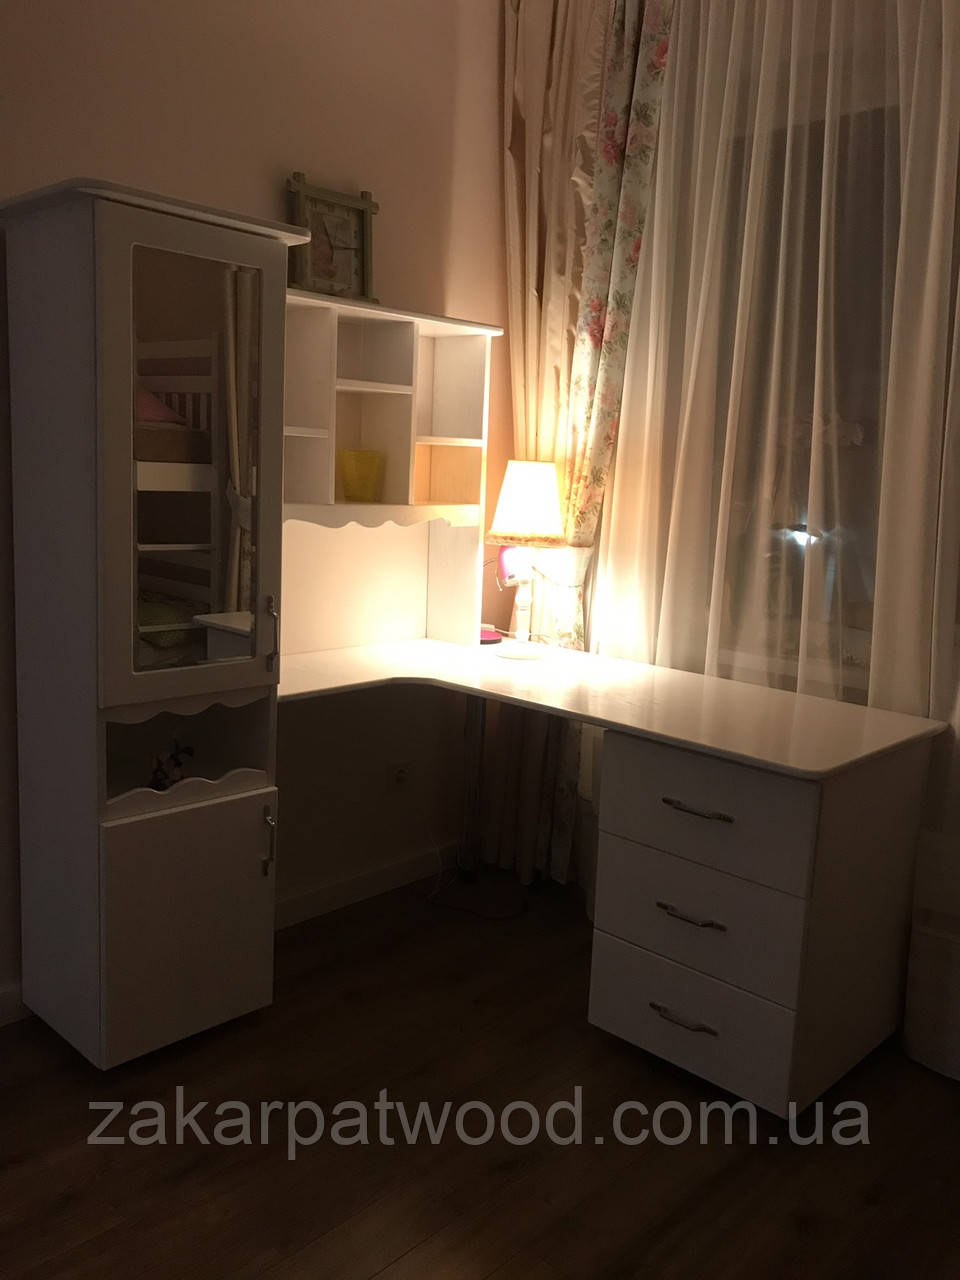 Мебель у кімнату масив дуба із елементами різьби